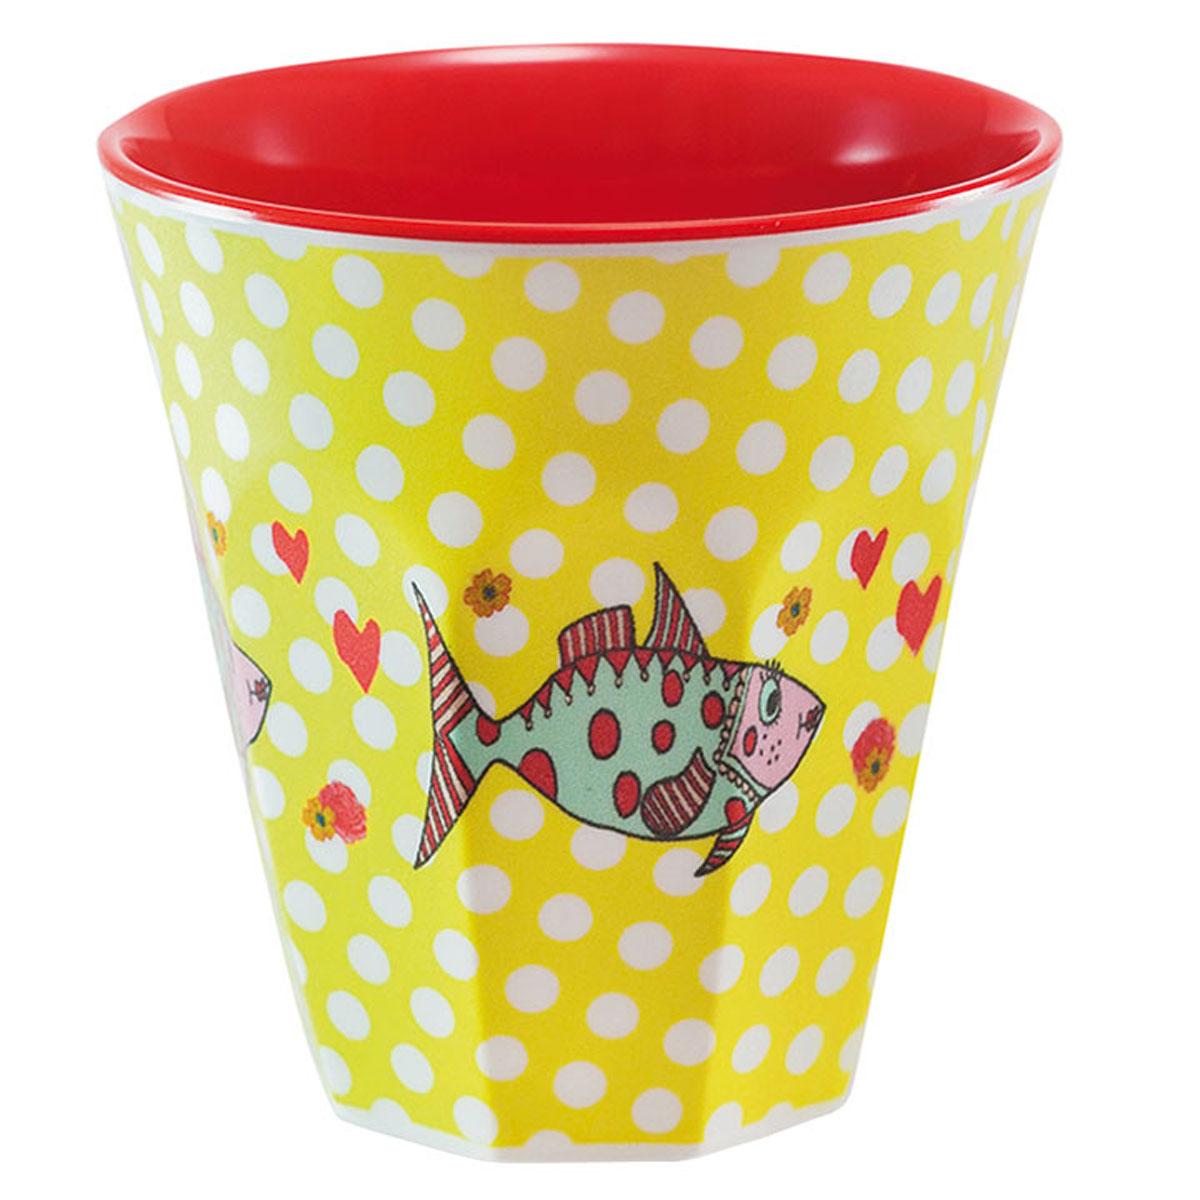 Gobelet mélamine \'Saperlipopette\' jaune rouge (Mrs Fish) - 75x75 cm - [R0625]